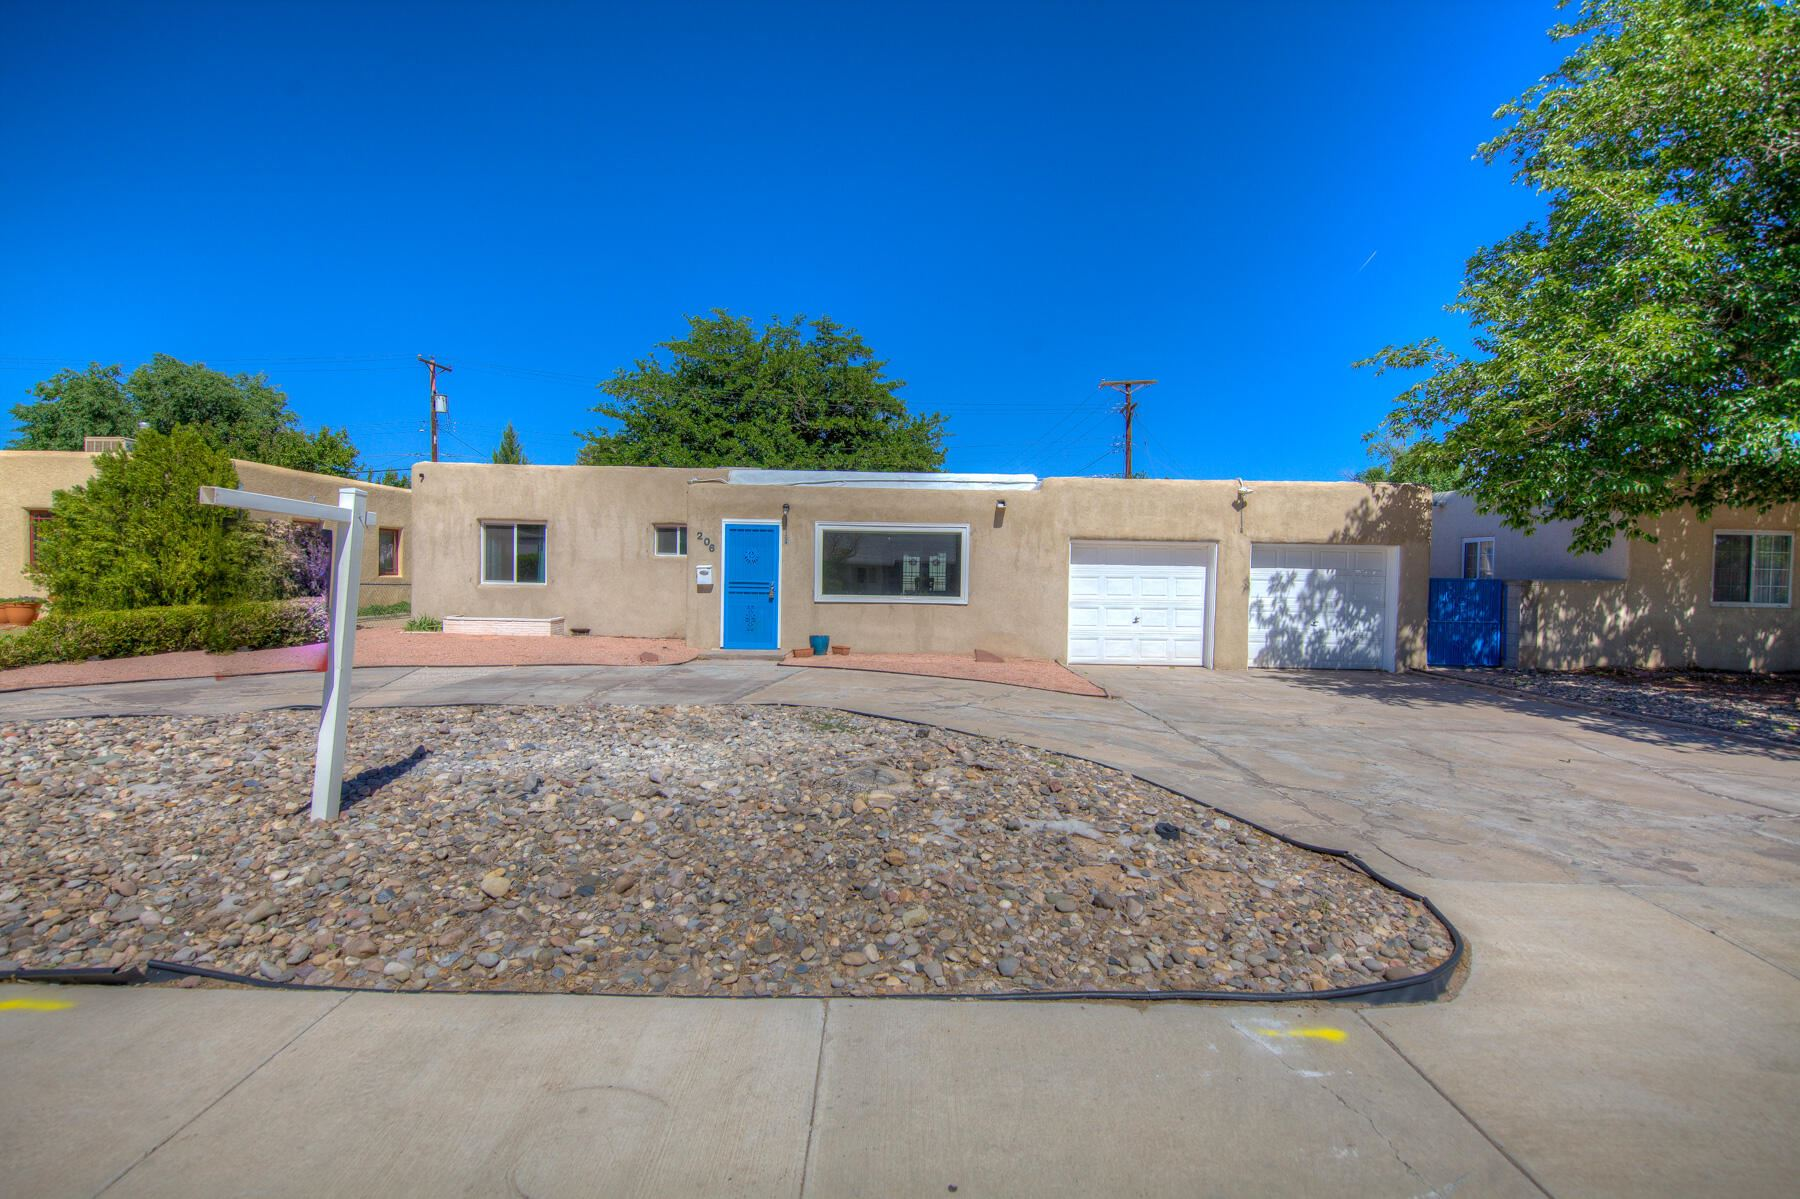 Photo of 206 MORNINGSIDE Drive NE, Albuquerque, NM 87108 (MLS # 992876)